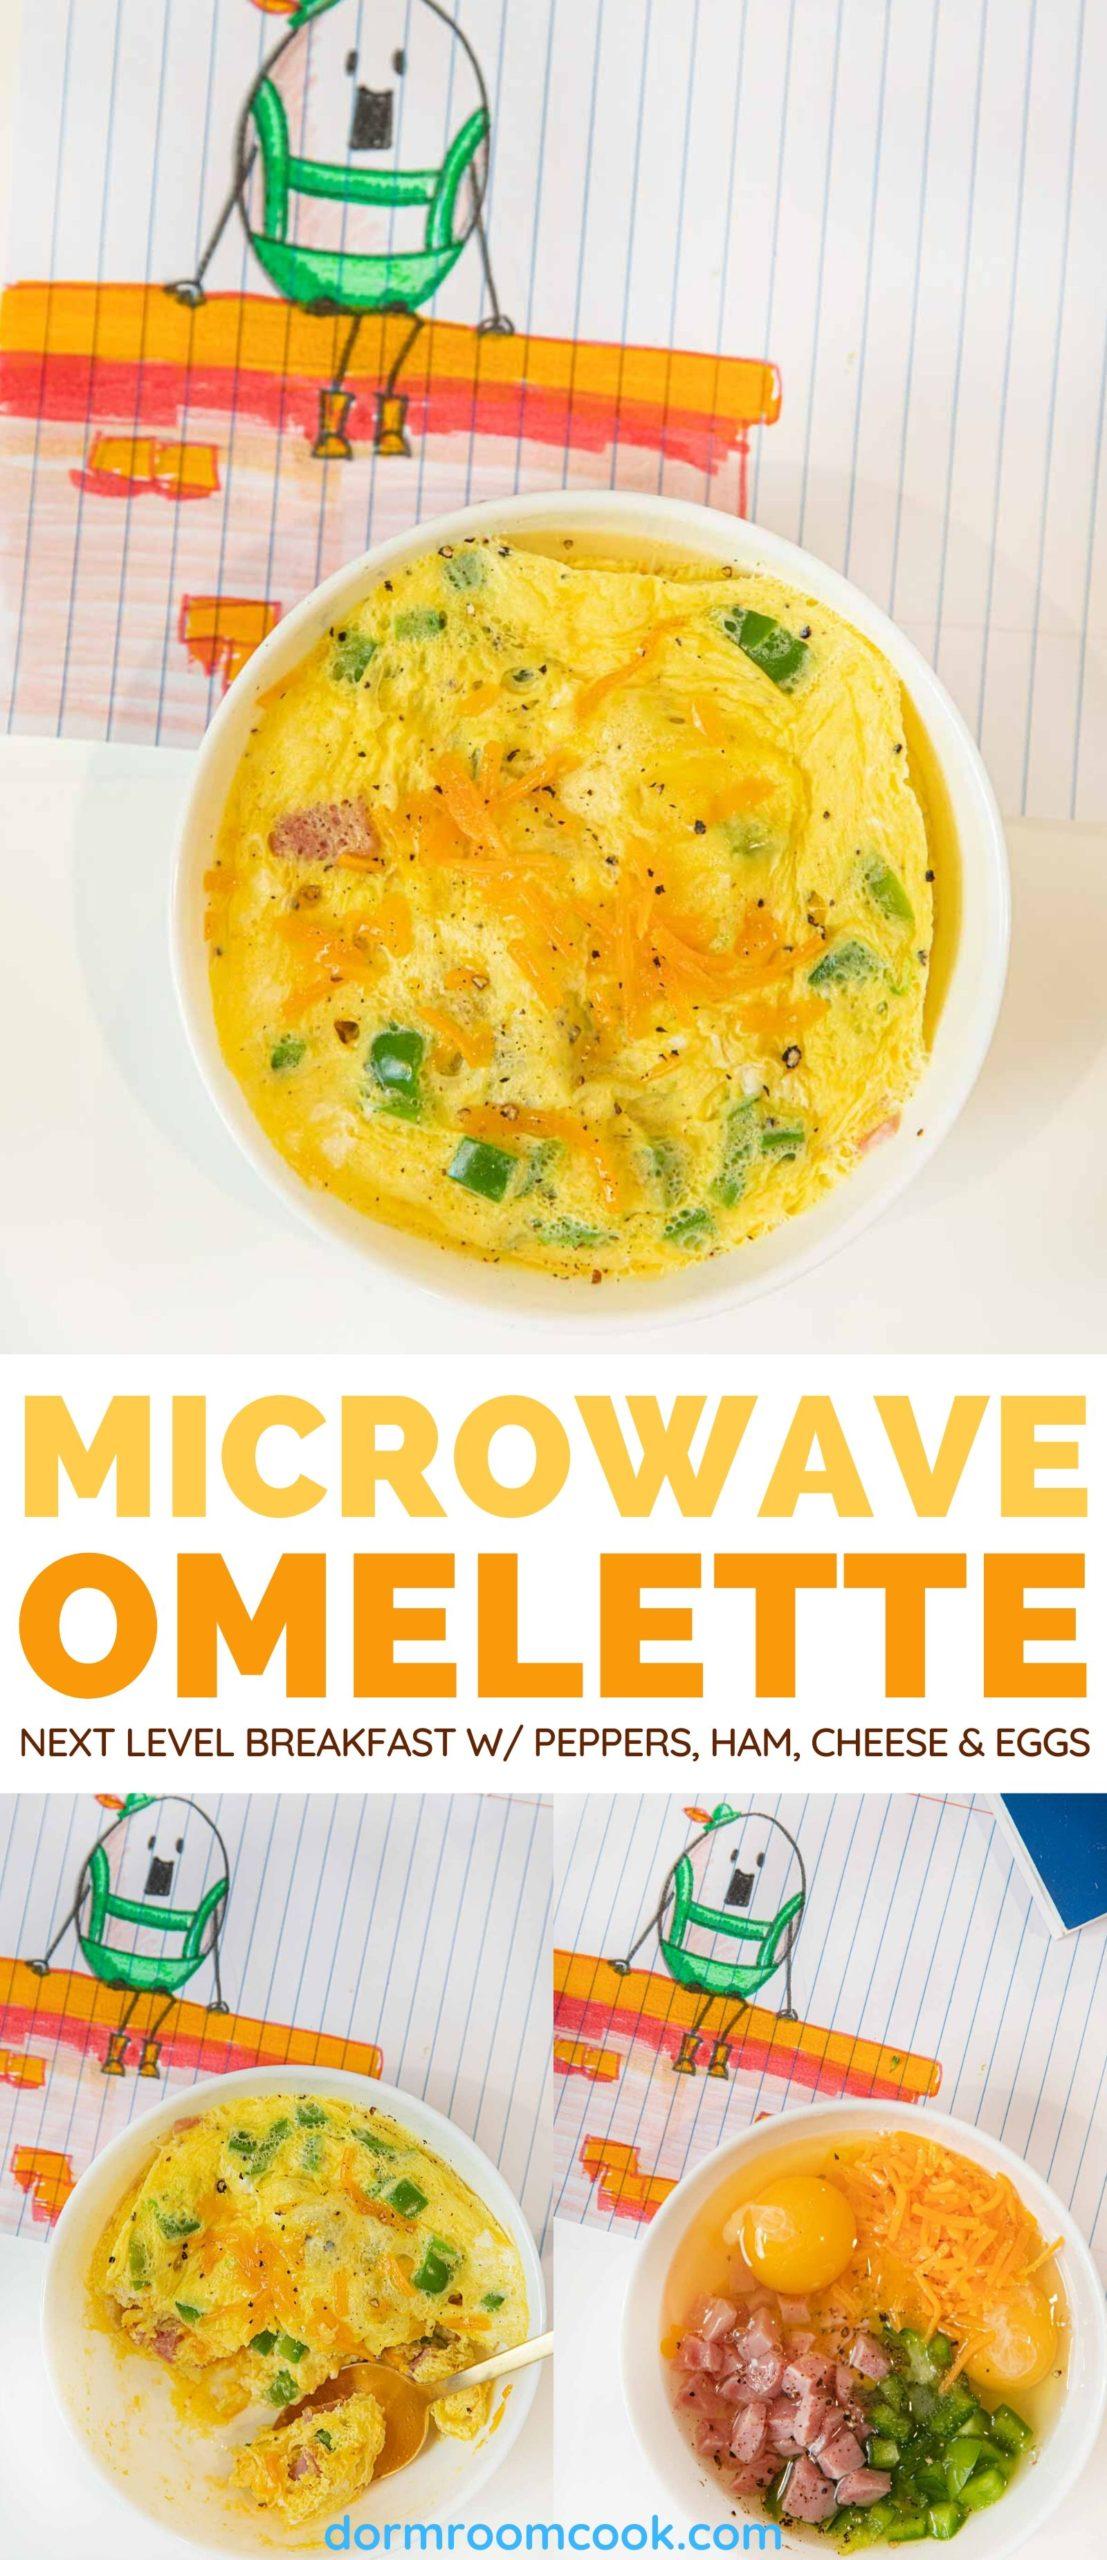 Easy Microwave Omelette